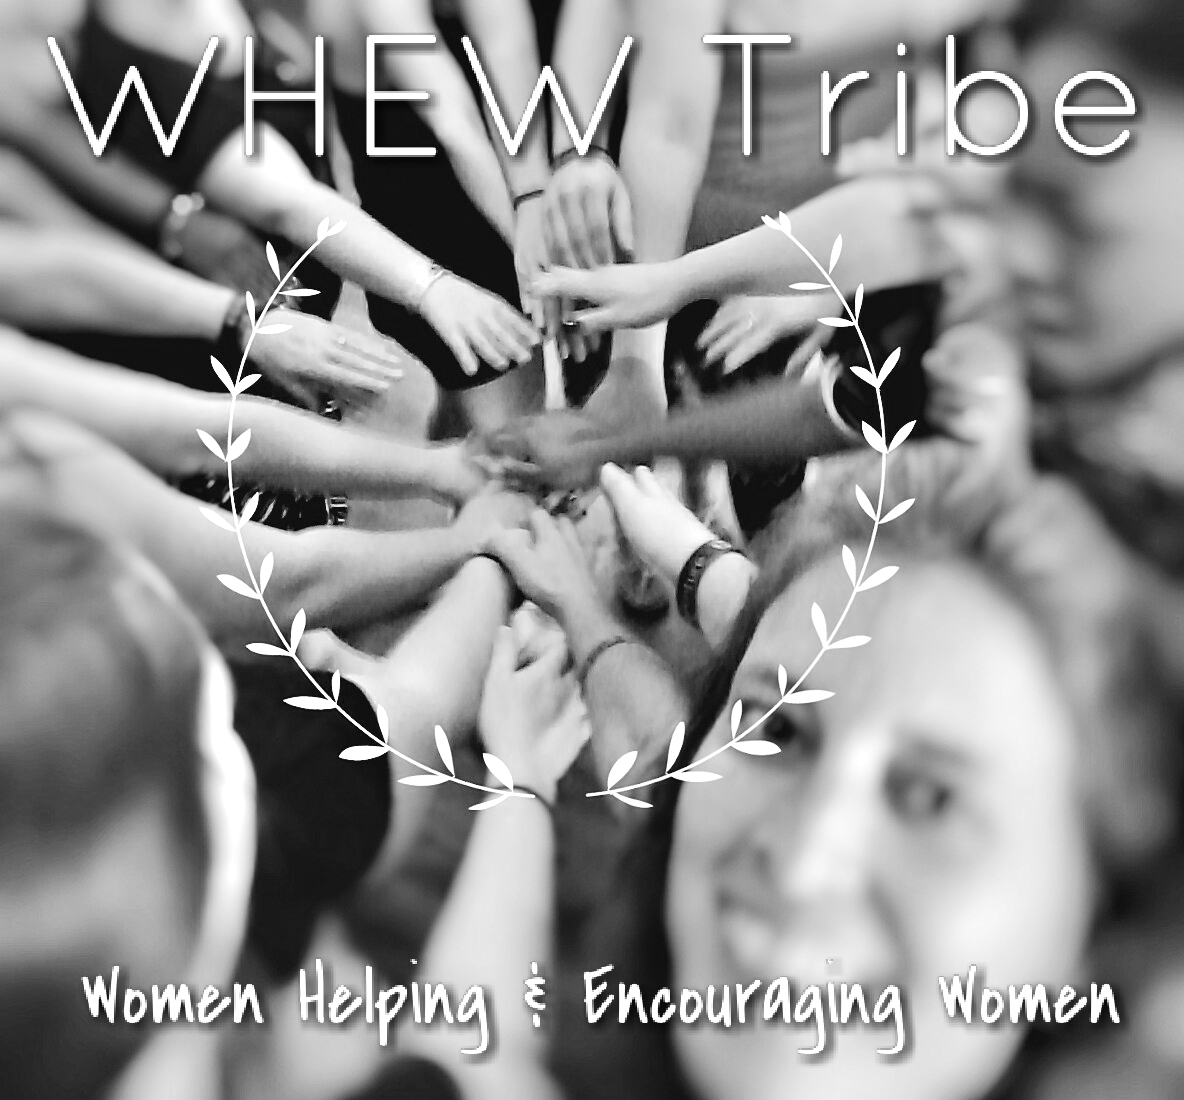 WHEW Tribe